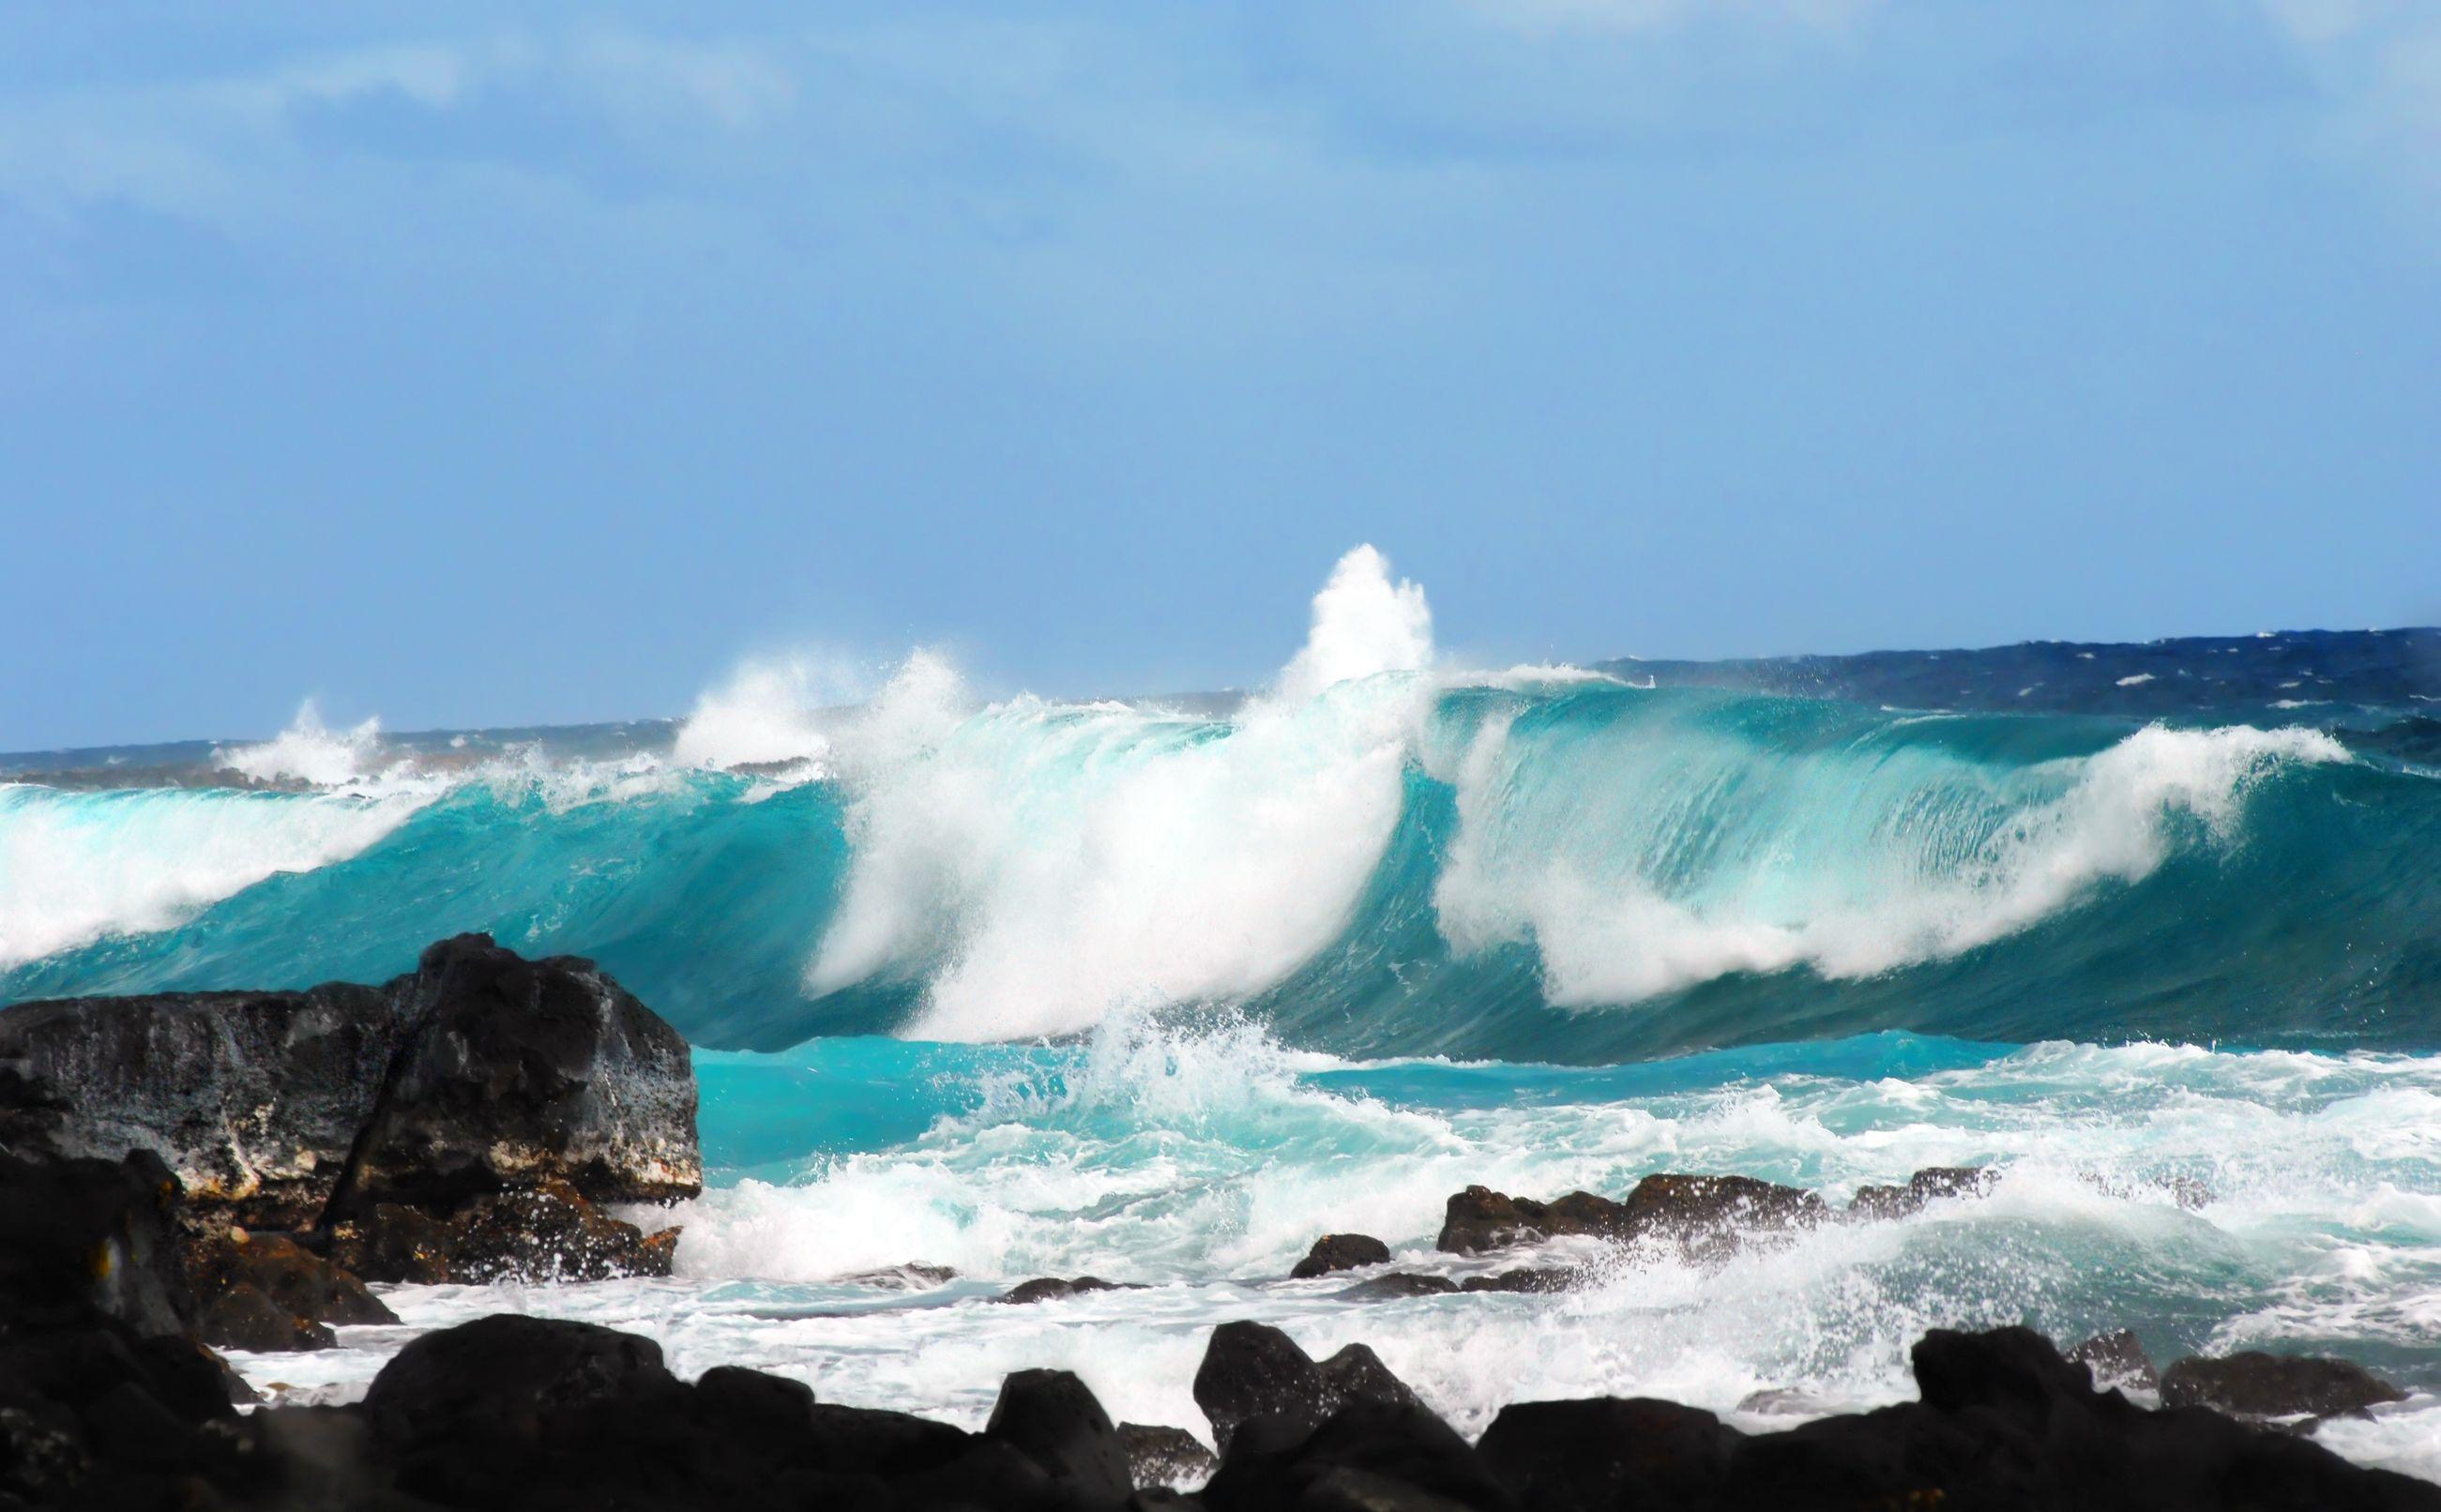 australia waves crashing rocks 123rf